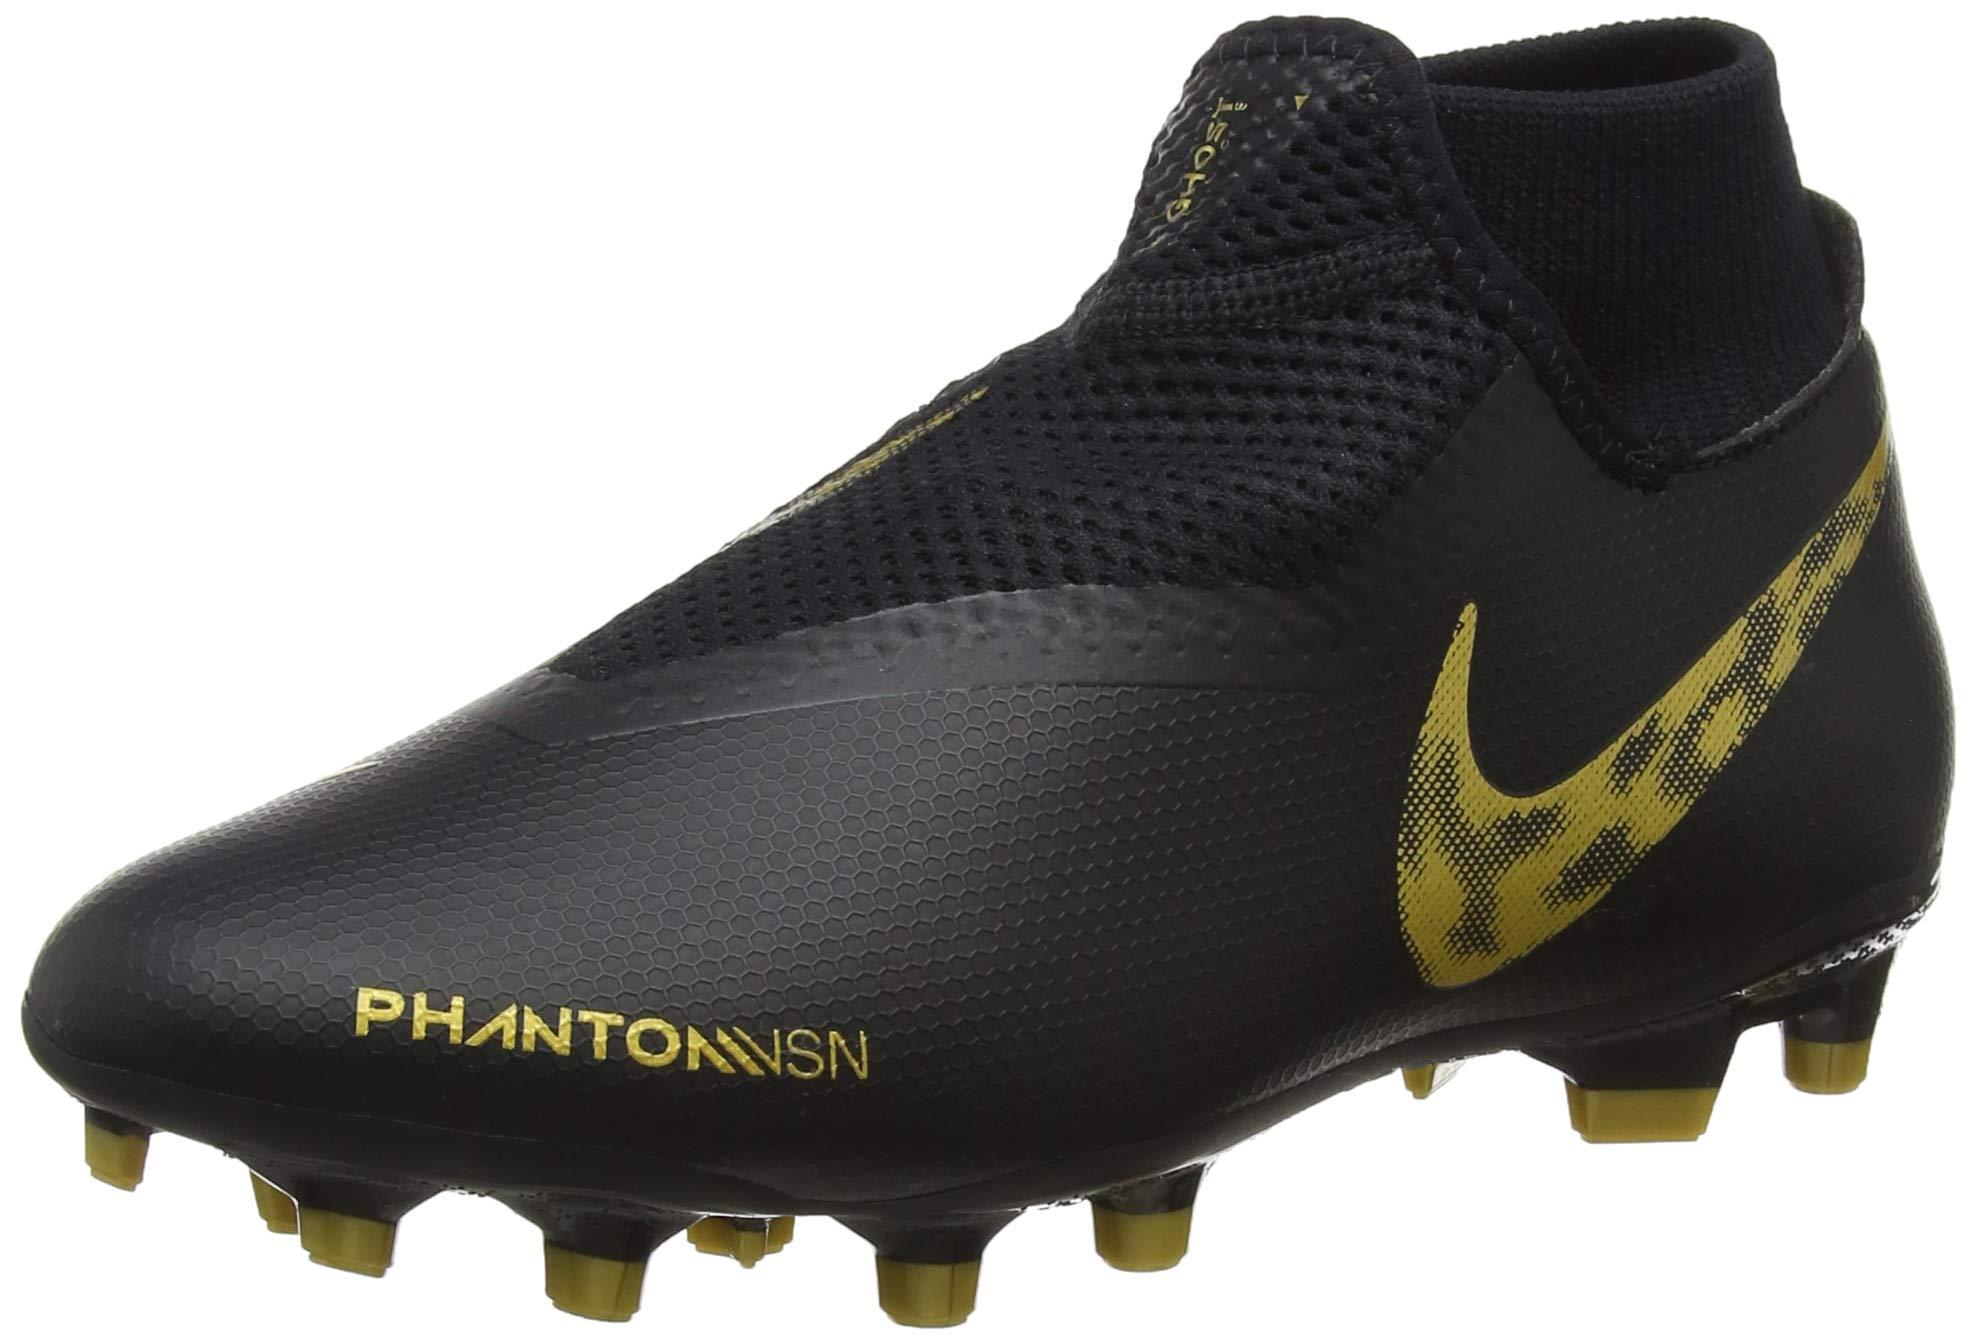 mtlc mgChaussures Vivid Nike Phantom Football Fg 07745 Df De 5 Eu Vsn AdulteMulticoloreblack Academy Gold Mixte uTPkZOXi